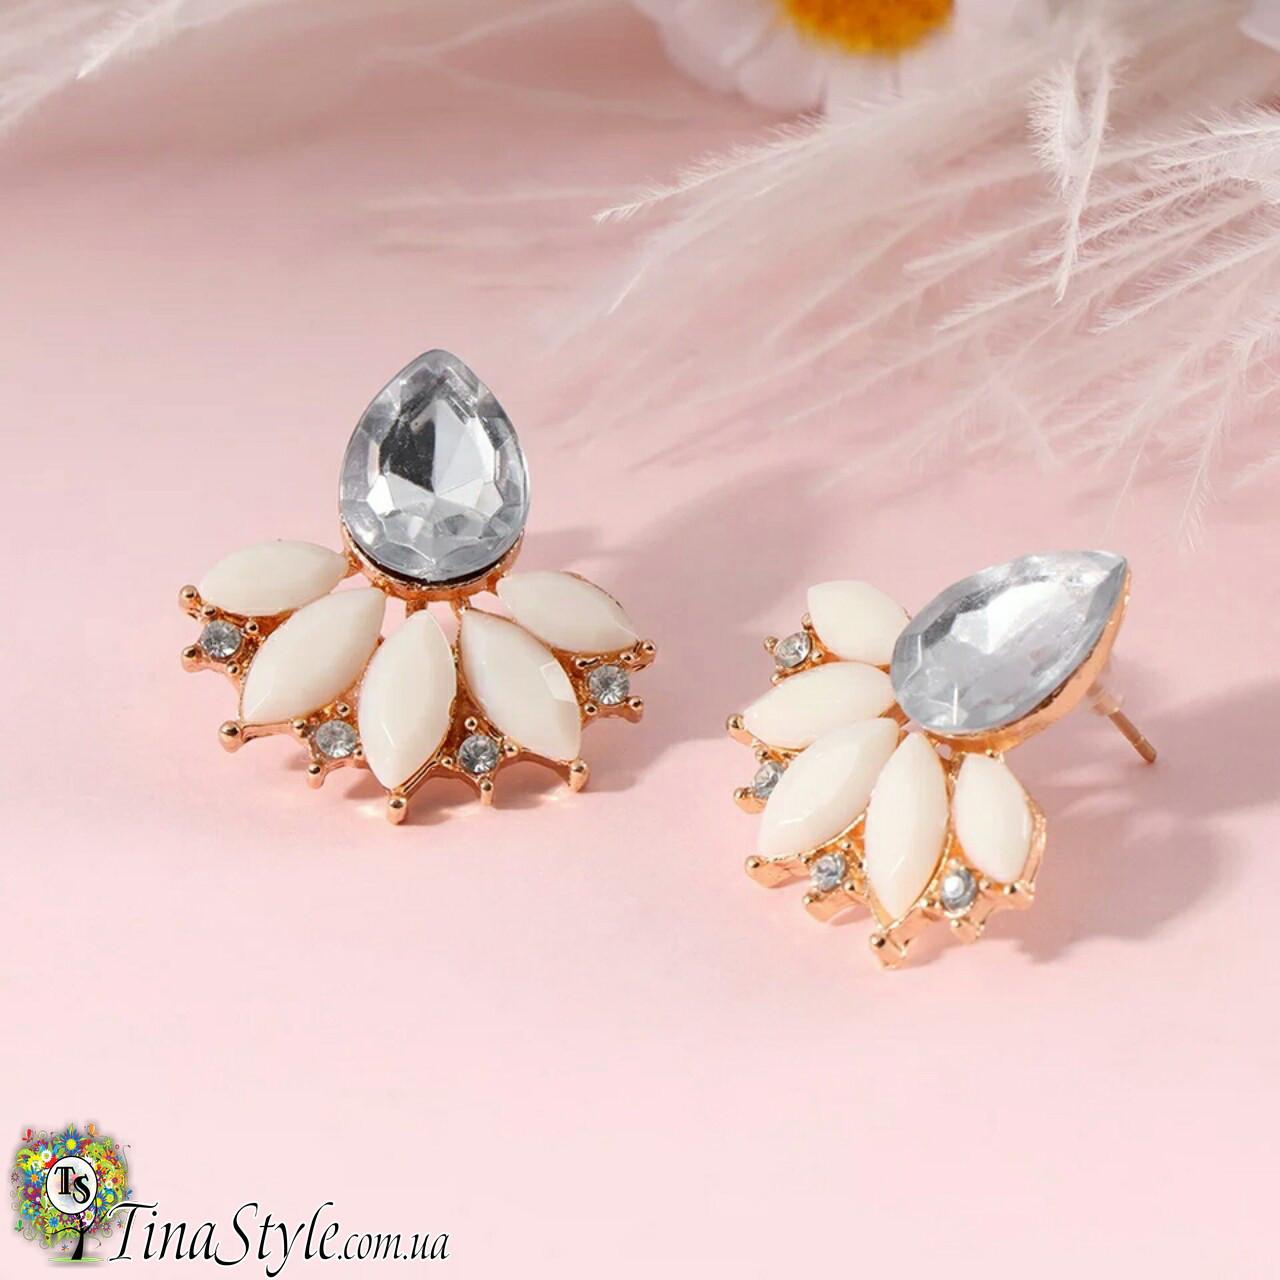 Серьги цветок кристалы камни белые прозрачные сережки ретро бренд